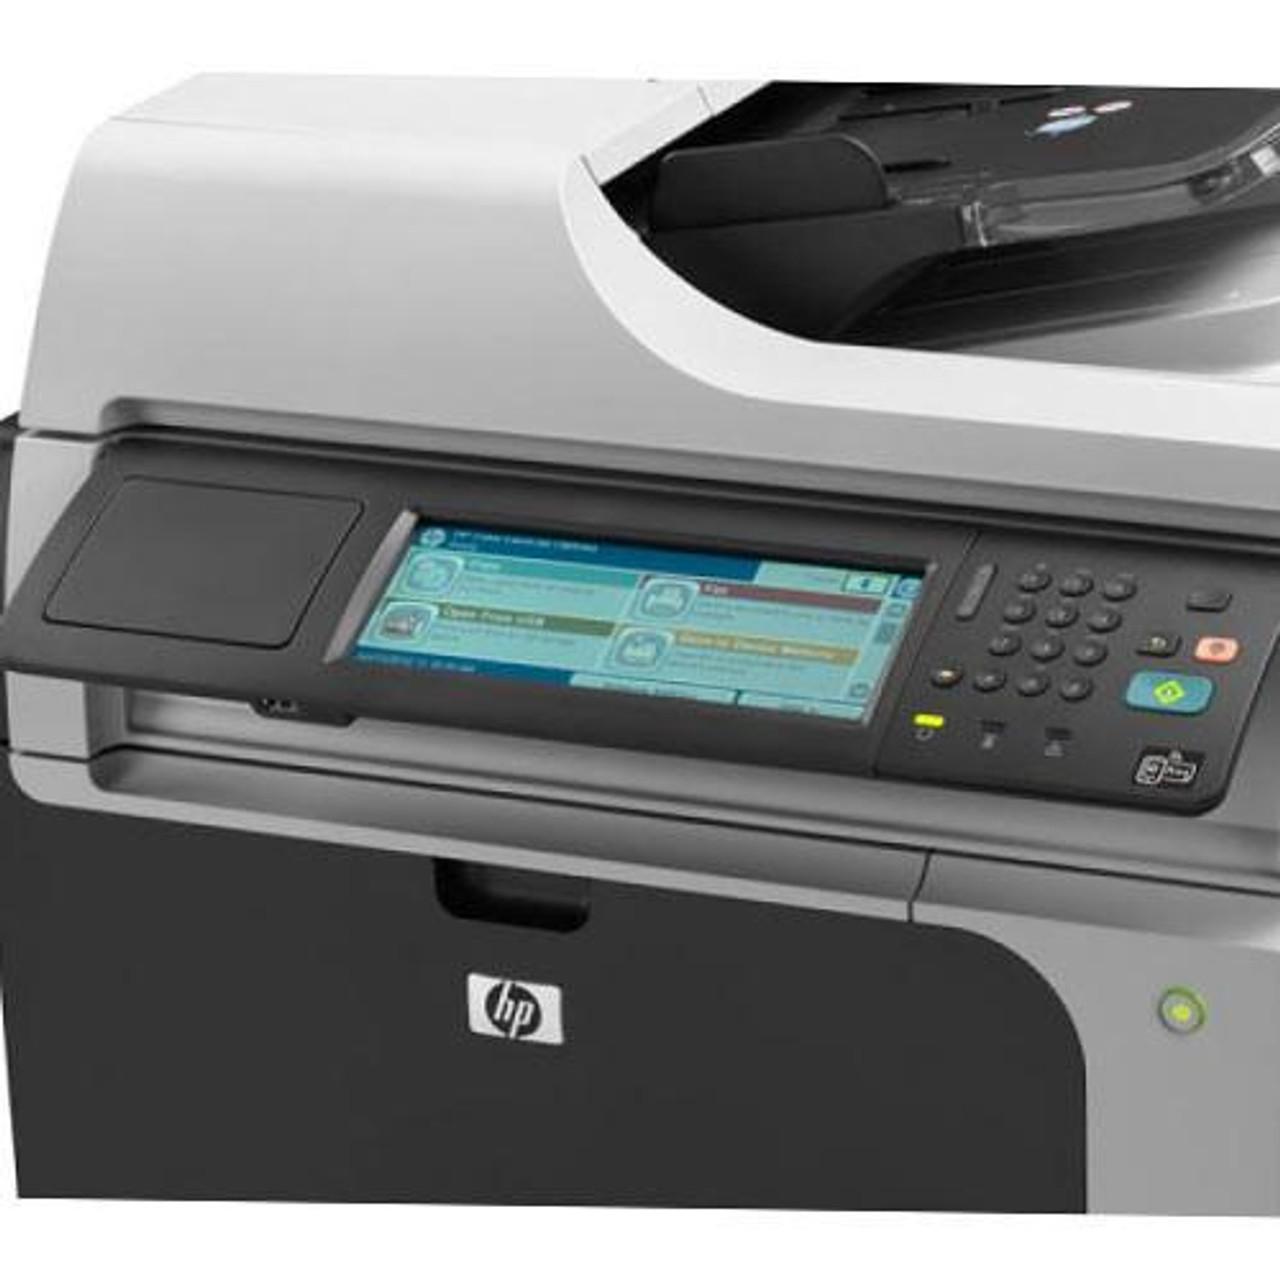 HP Color LaserJet CM4540f MFP - 42 ppm - 1100 sheet